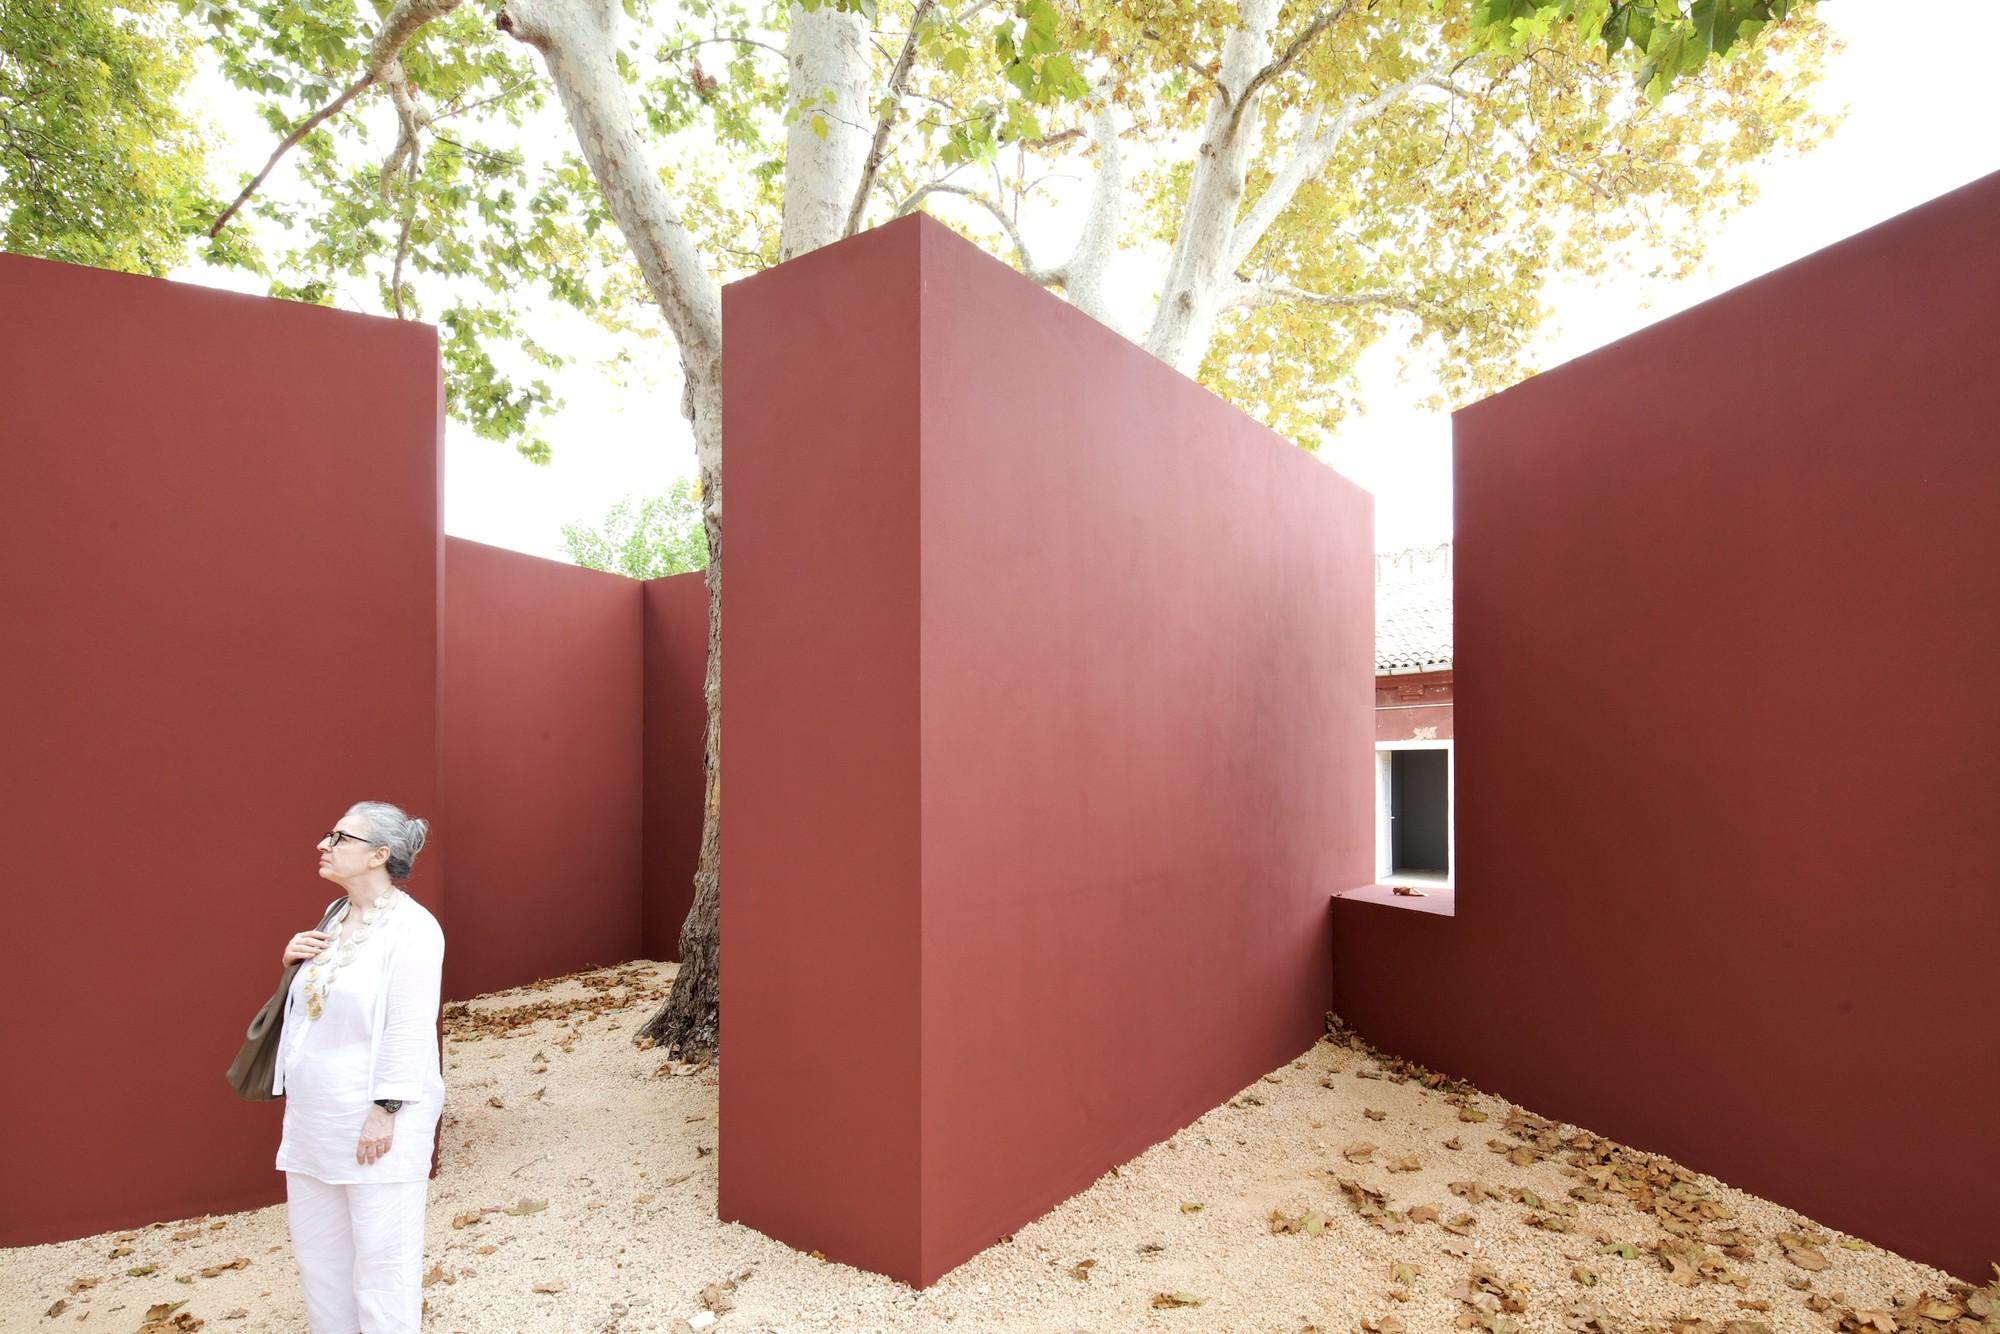 Pabellón de Álvaro Siza va a ser mantenido en la Bienal de Venecia hasta 2016, Pabellón de Álvaro Siza © Nico Saieh